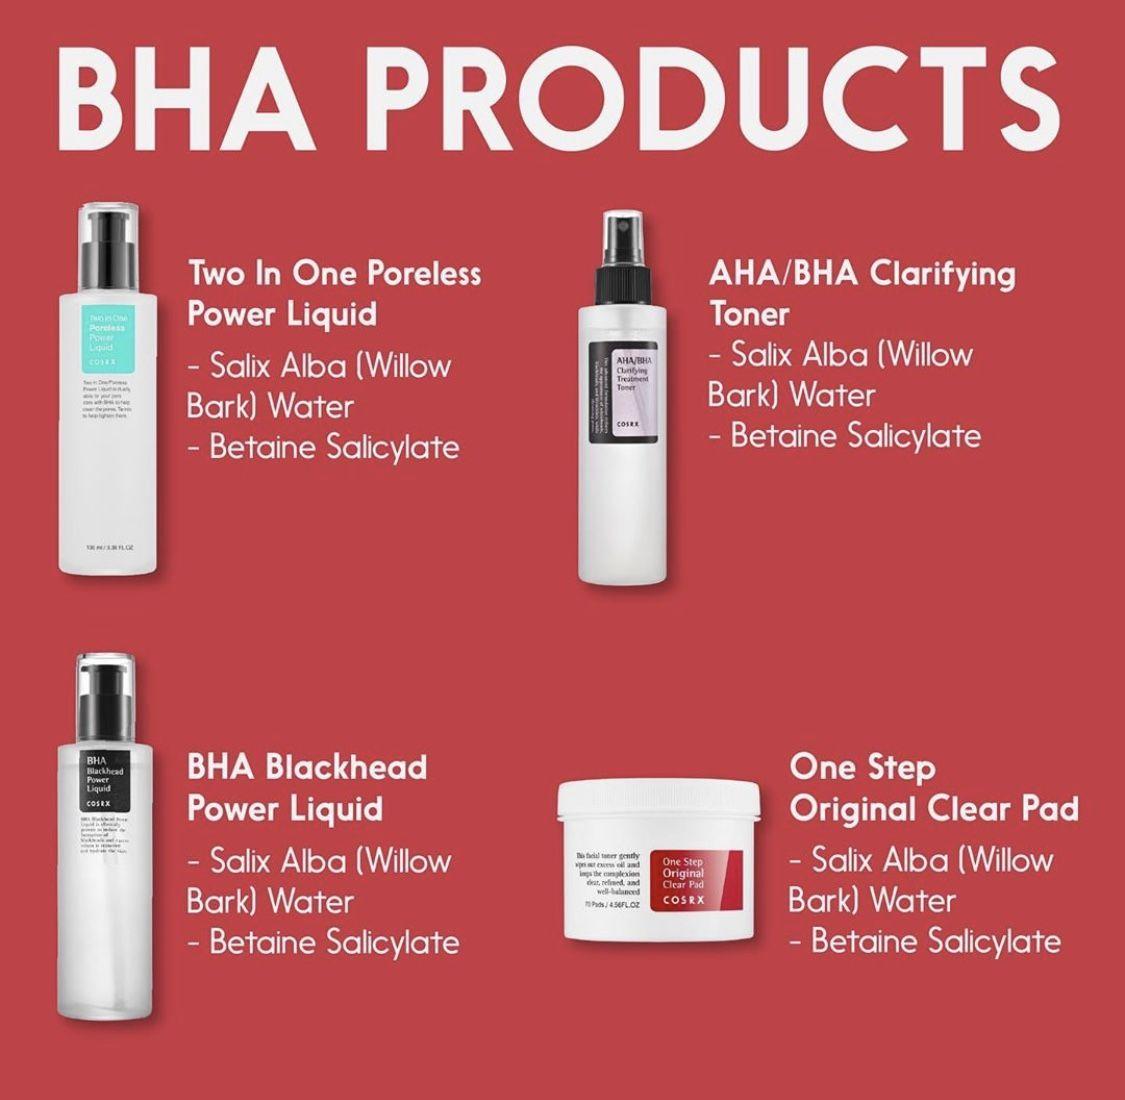 Beta Hydroxy Acid Bha Eksfoliasi Untuk Kulit Berminyak Dan Berjerawat